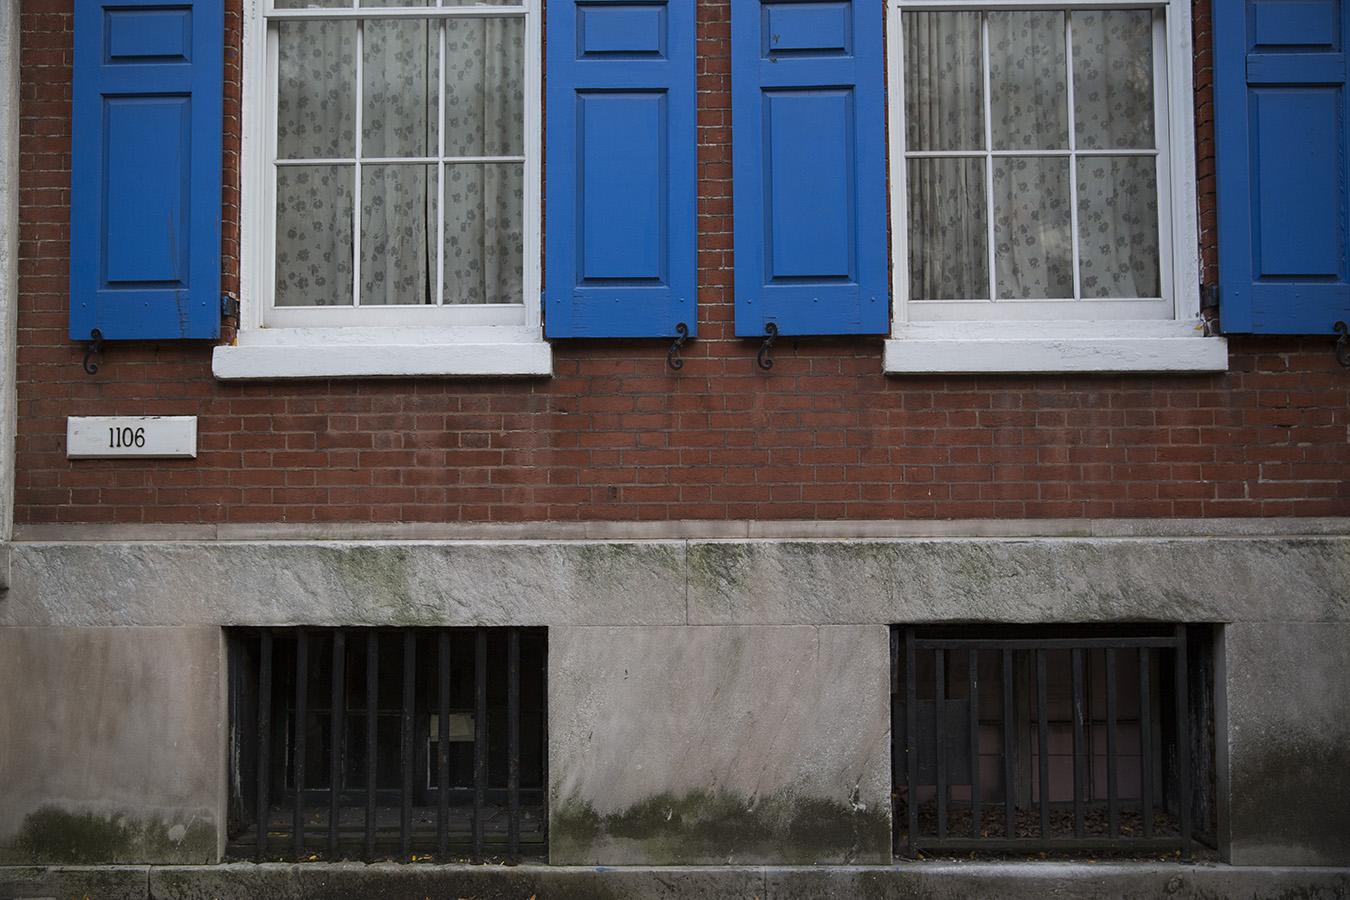 7_Blue_Casey Egner_Street Photography_Ornament_Shudders_facade copy